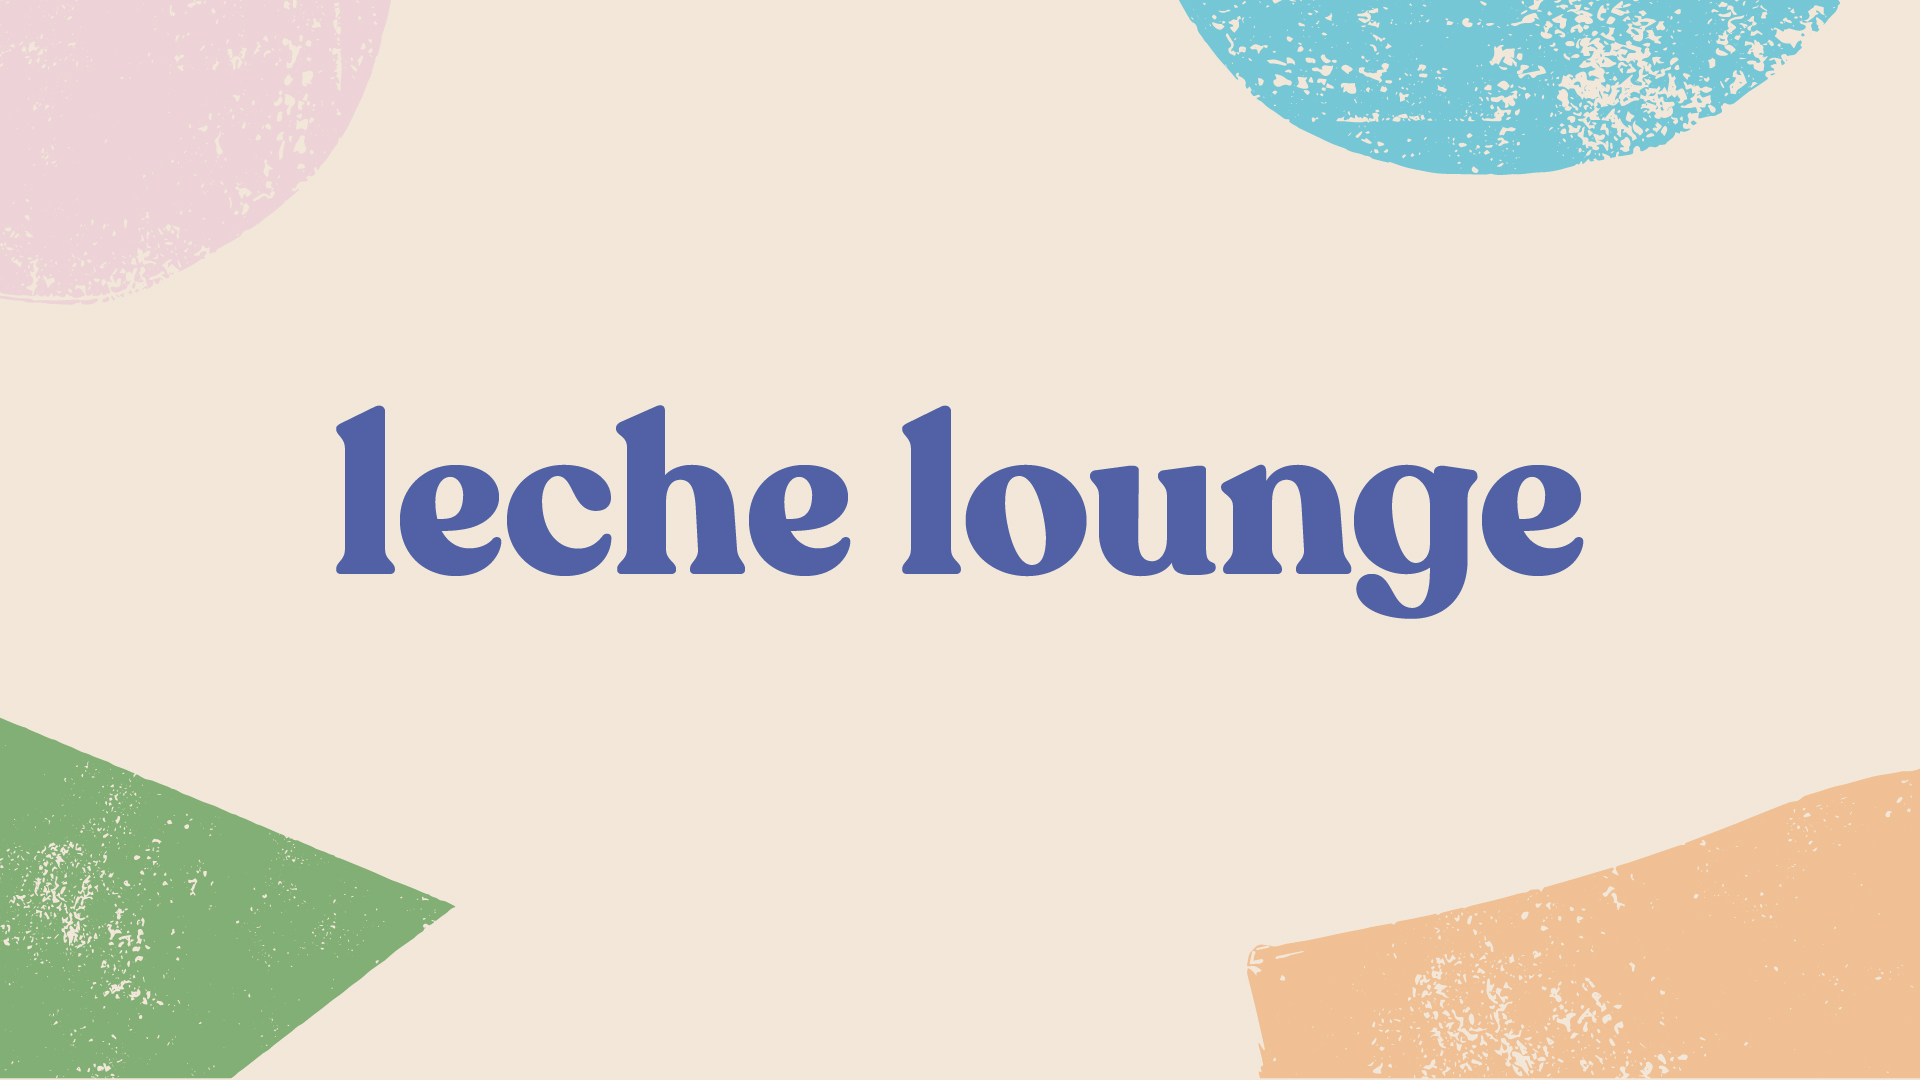 LecheLounge_header-image_2.jpg